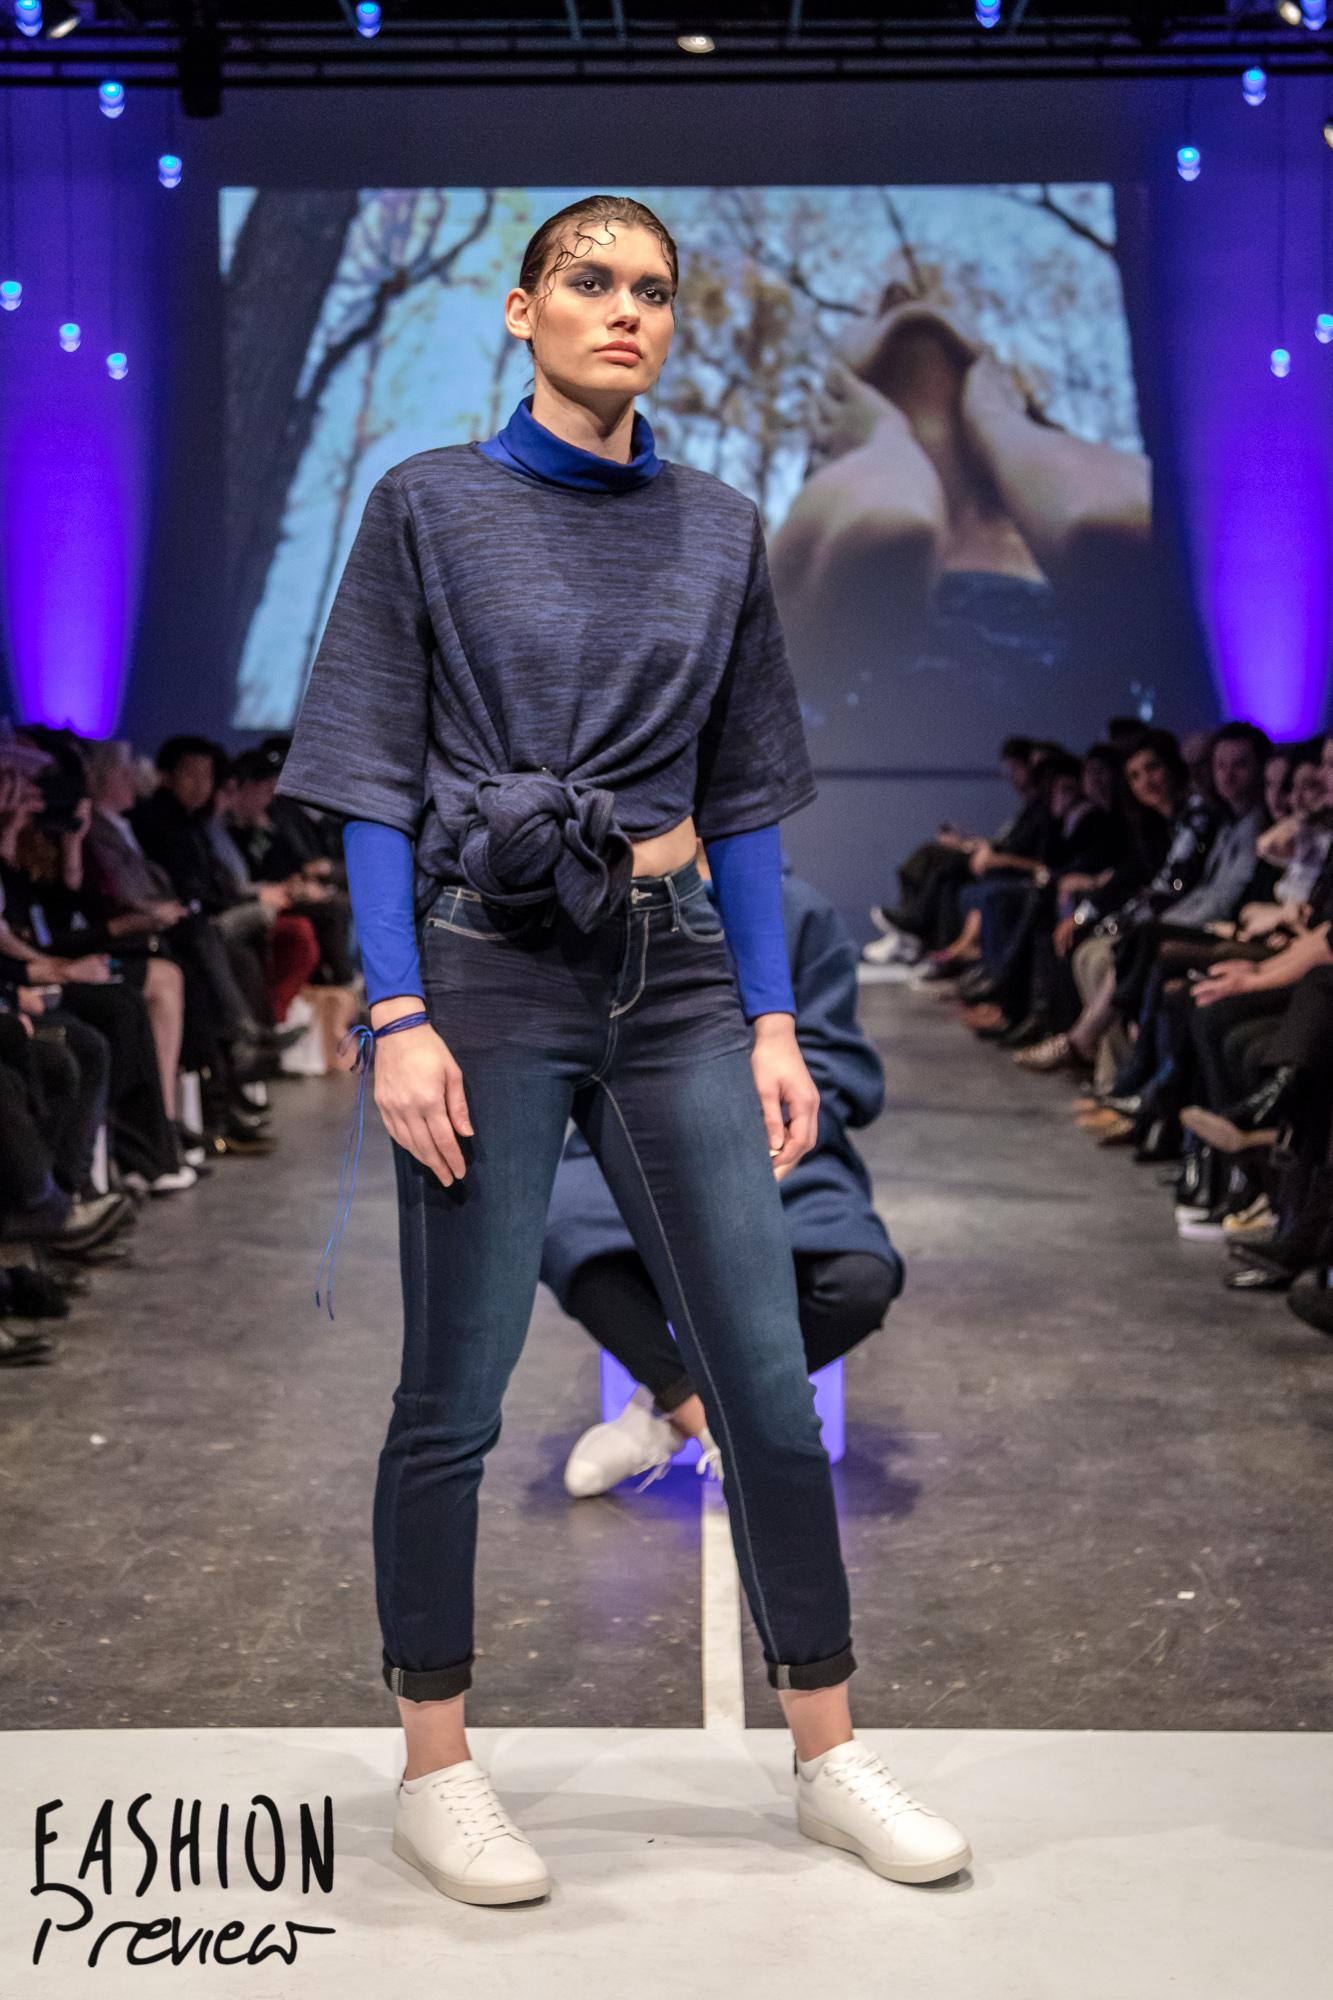 Fashion Preview 9 - Cegep Marie Victorin-18.jpg